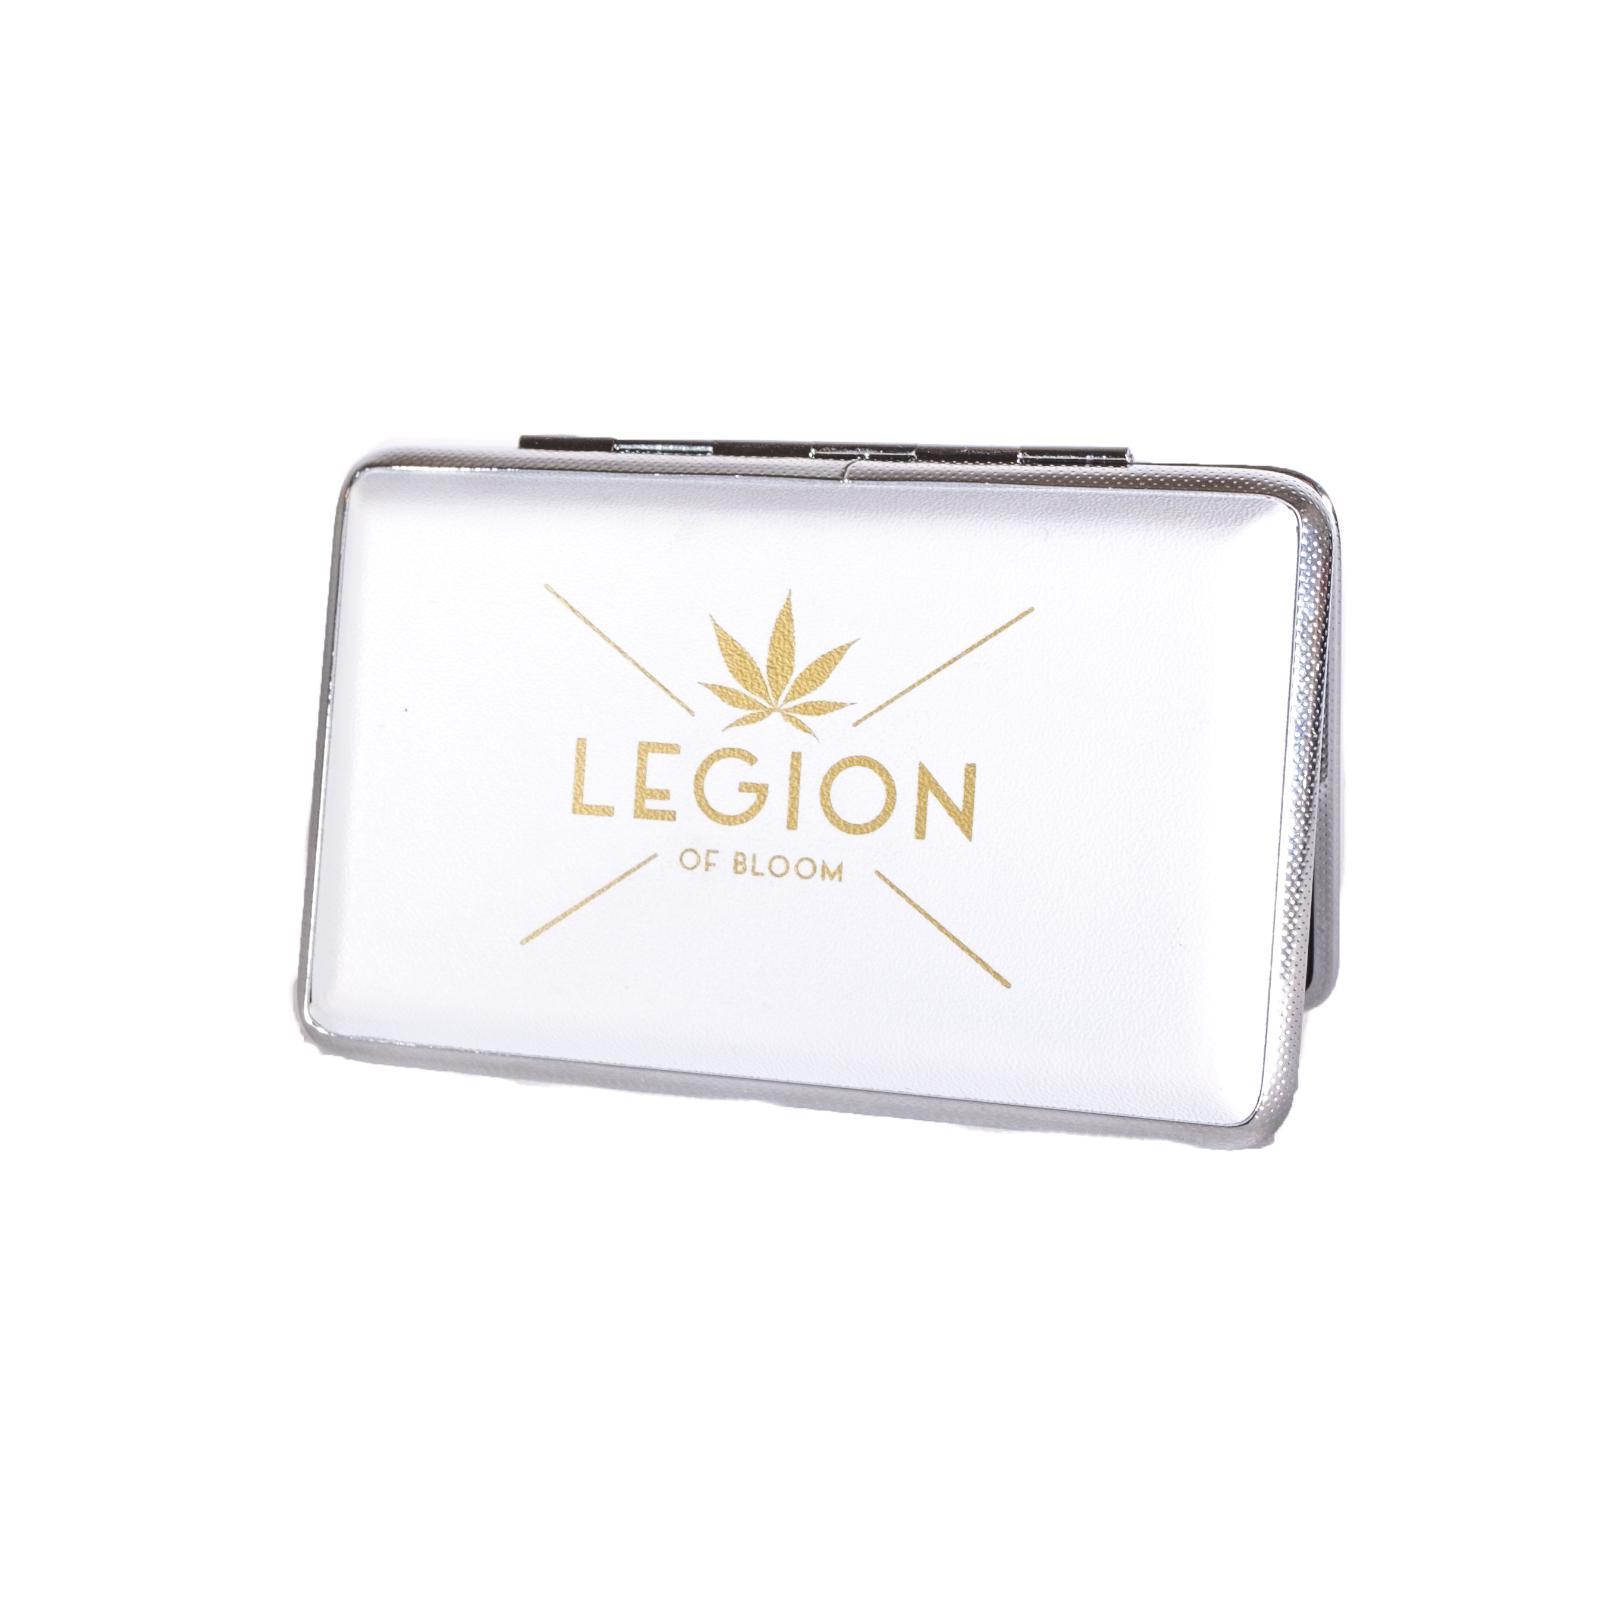 LegionOfBloomVaporizerClosed.png